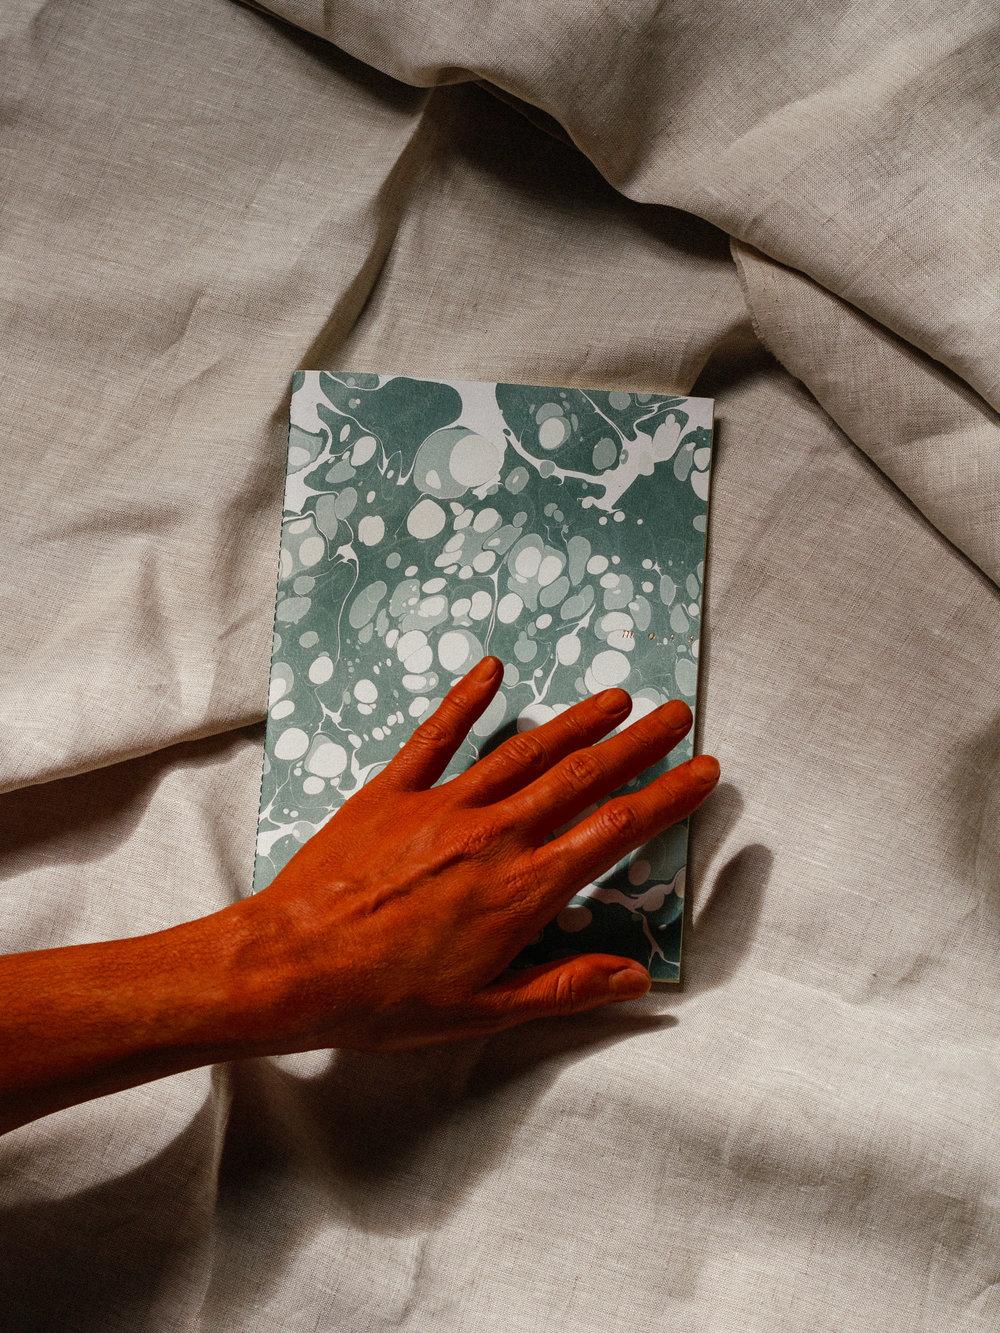 tomas-avinent-cahiers-52b.jpg